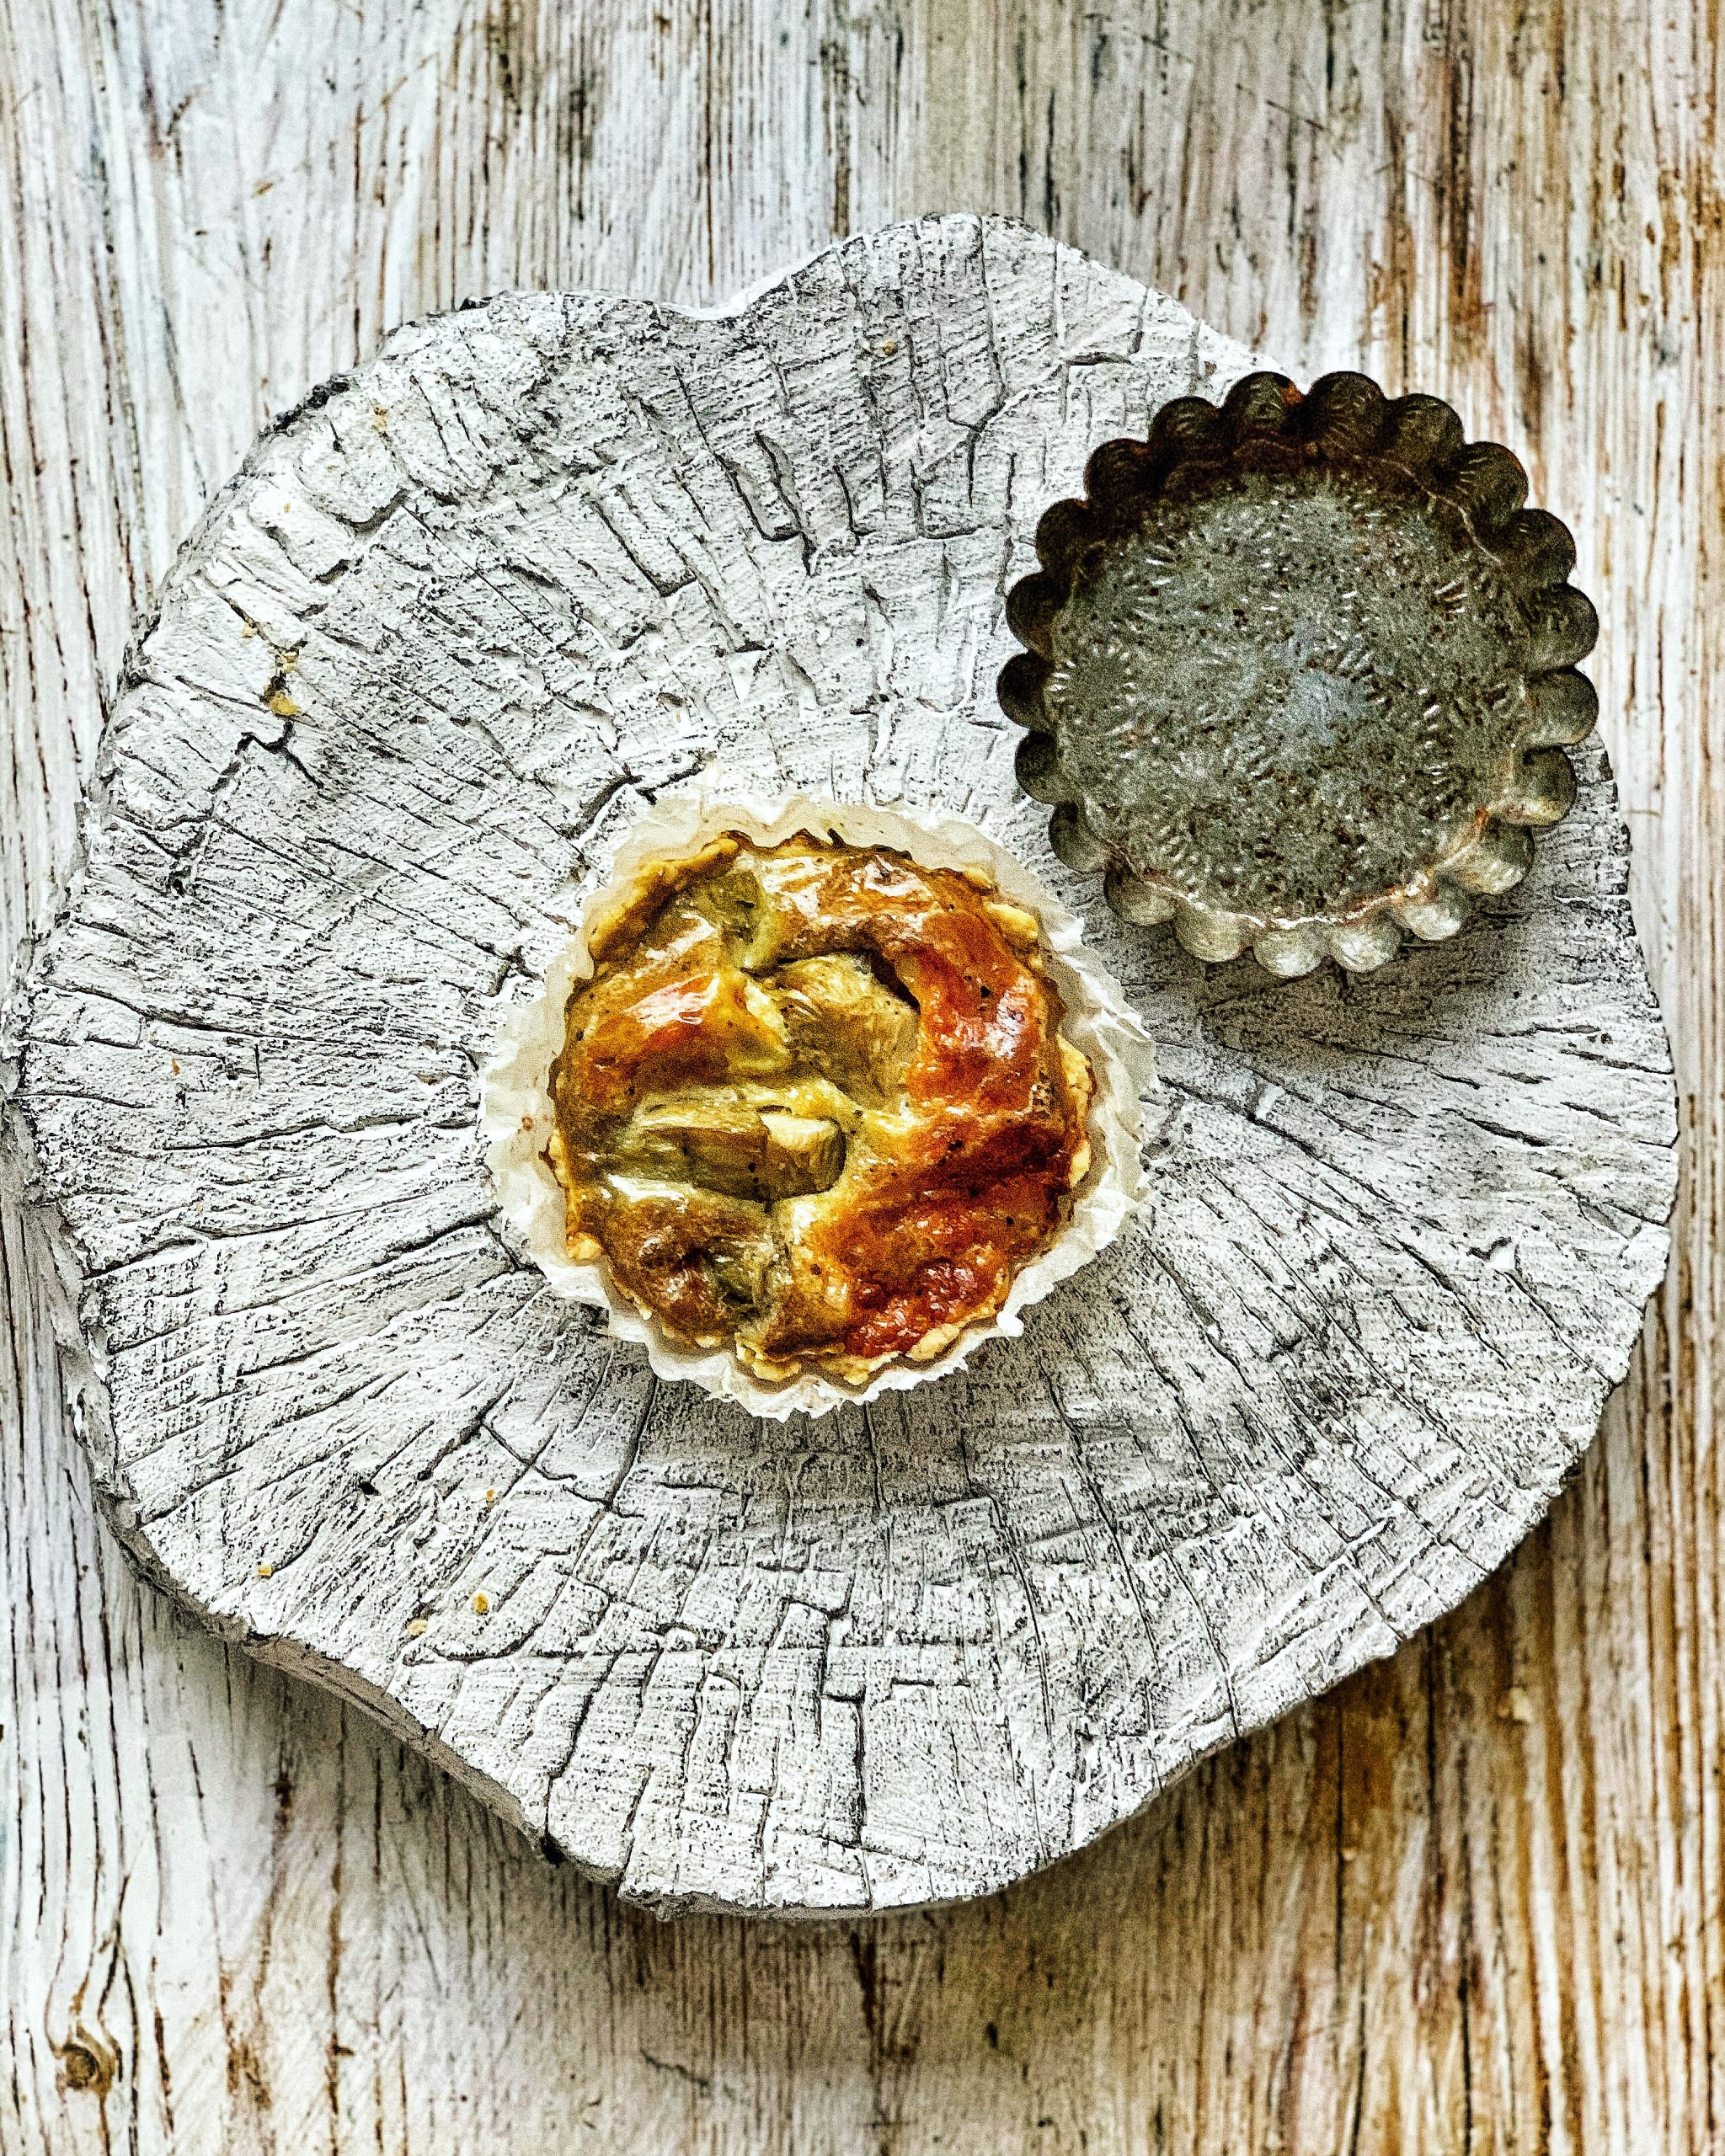 Summer food pic: Kerstin rodgers/msmarmitelover.com